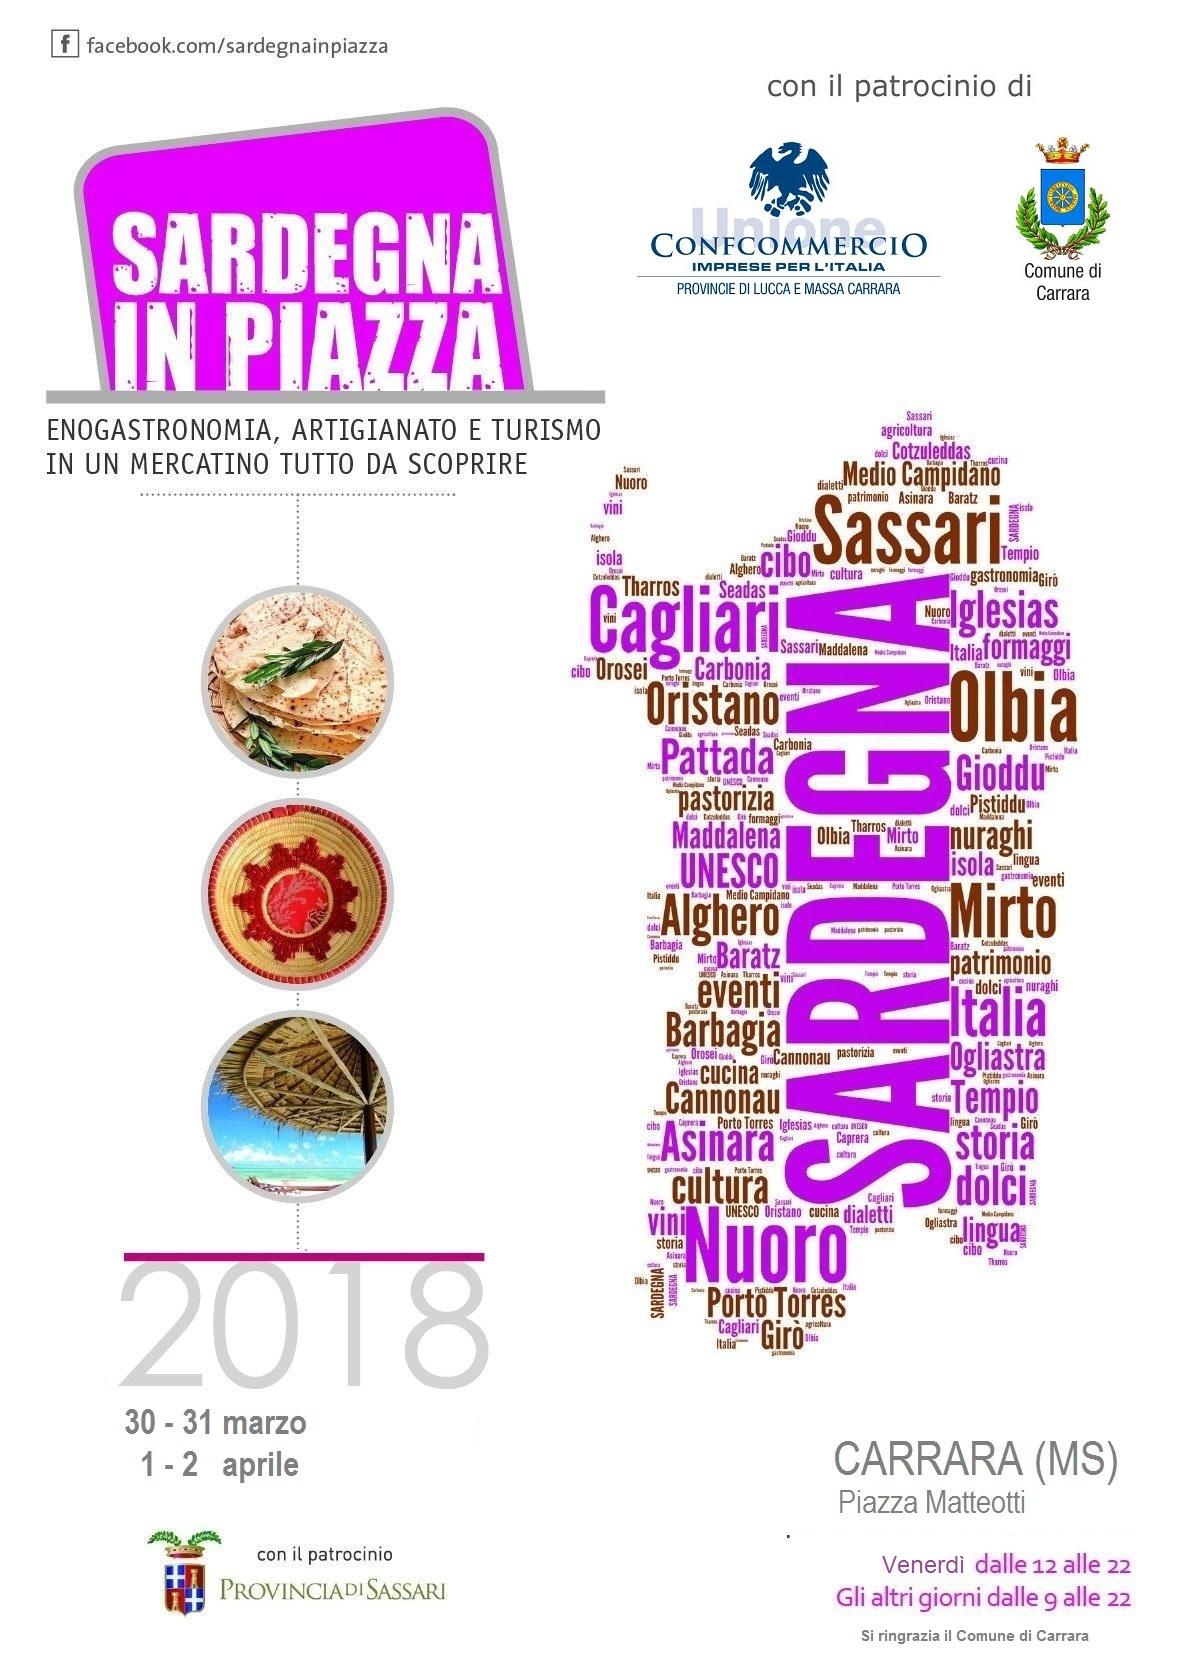 Sardegna in Piazza a Cesano Maderno